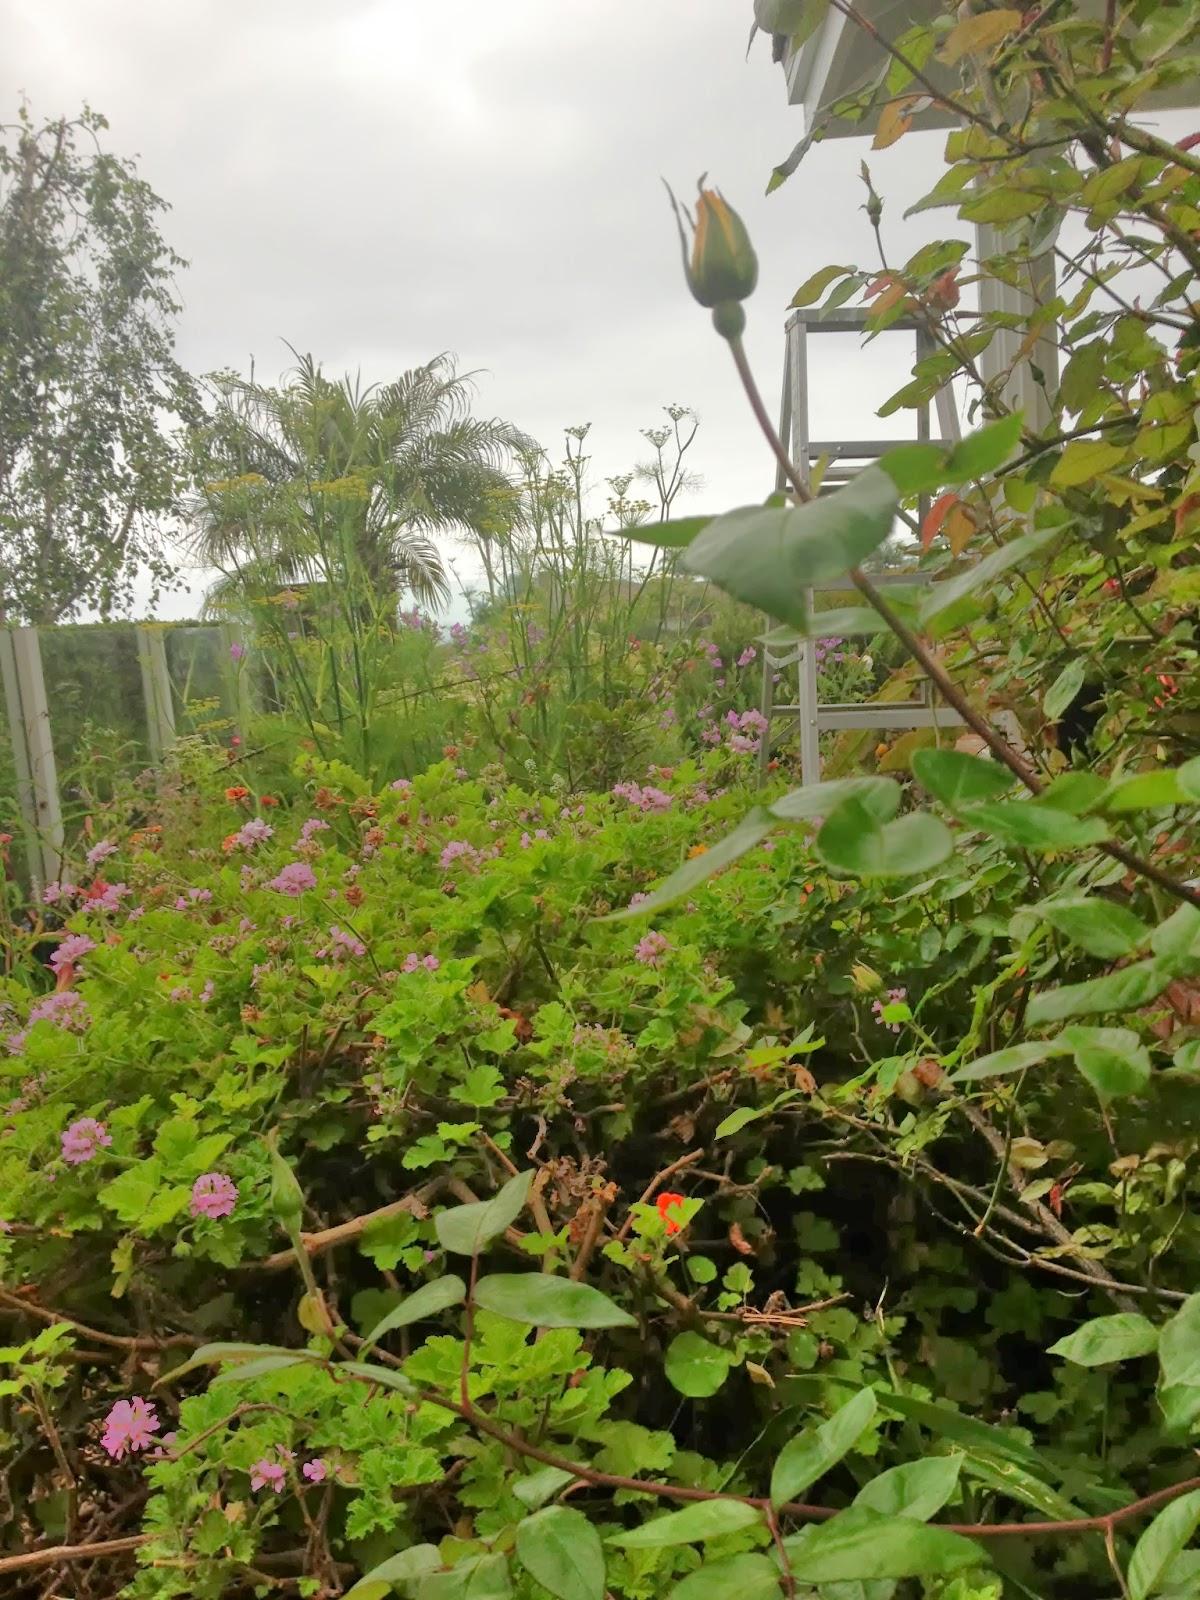 natural mosquito repellants Amazoncom : repel lemon eucalyptus natural insect repellent pump, 1 unit, 4-oz : mosquito repellent : garden & outdoor.